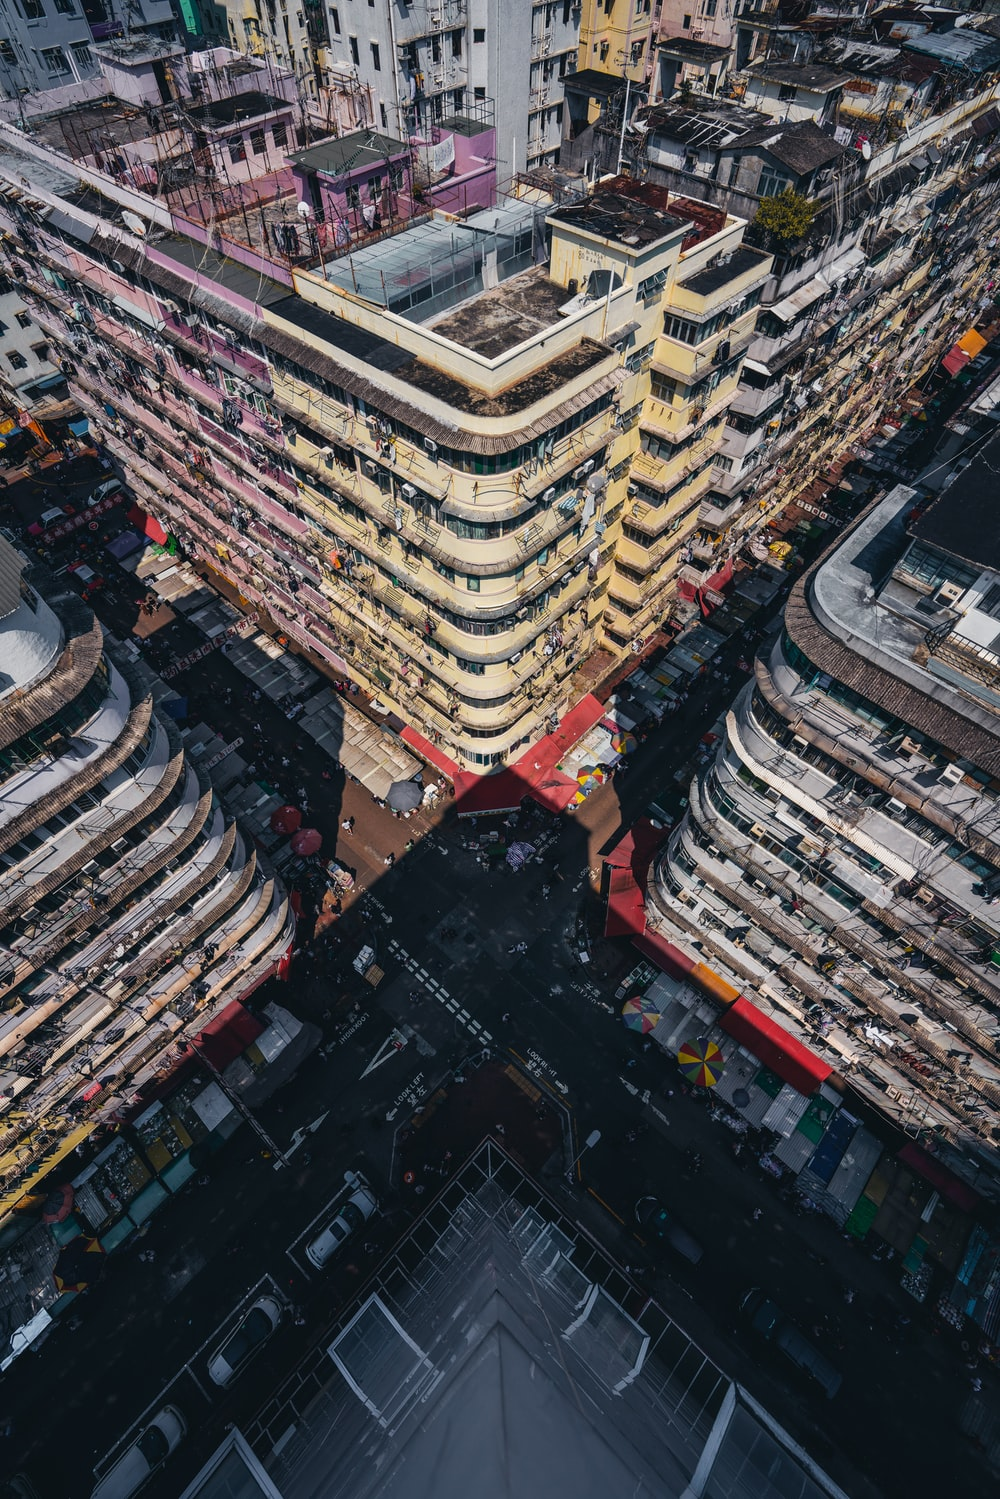 bird's eye view of high-rise building